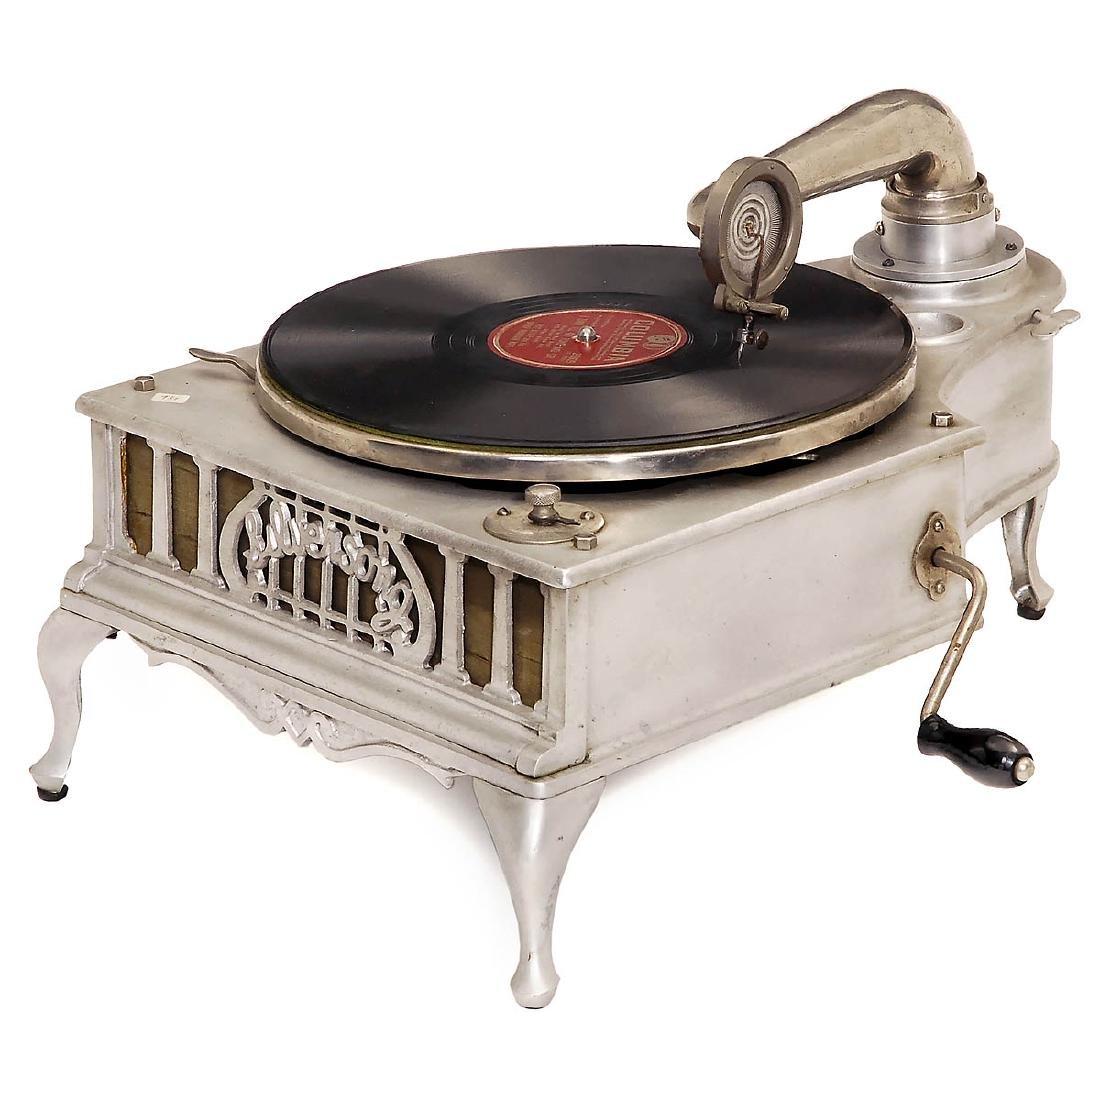 Silversong Gramophone, c. 1925